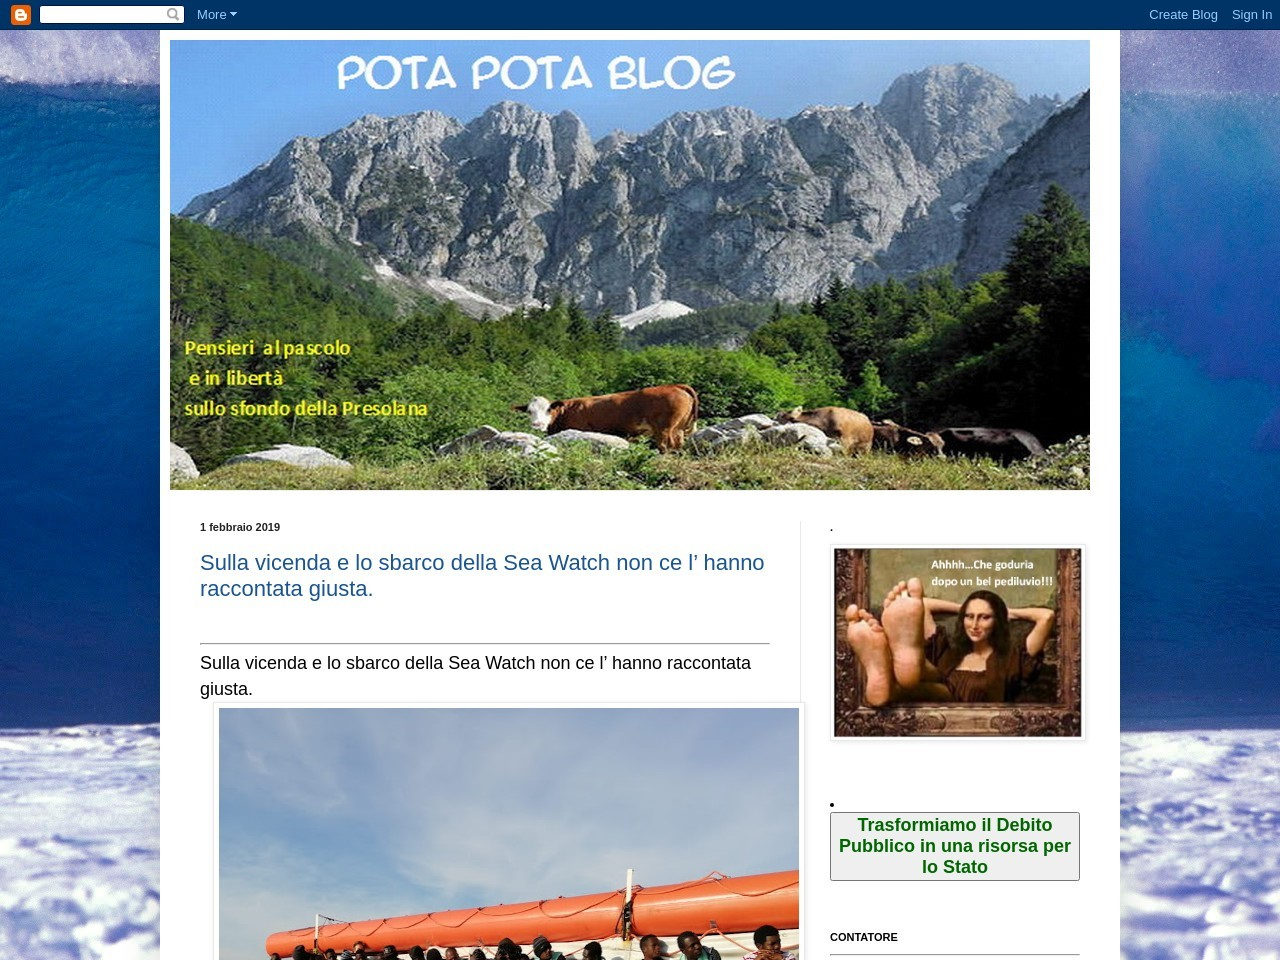 pota-pota-blog